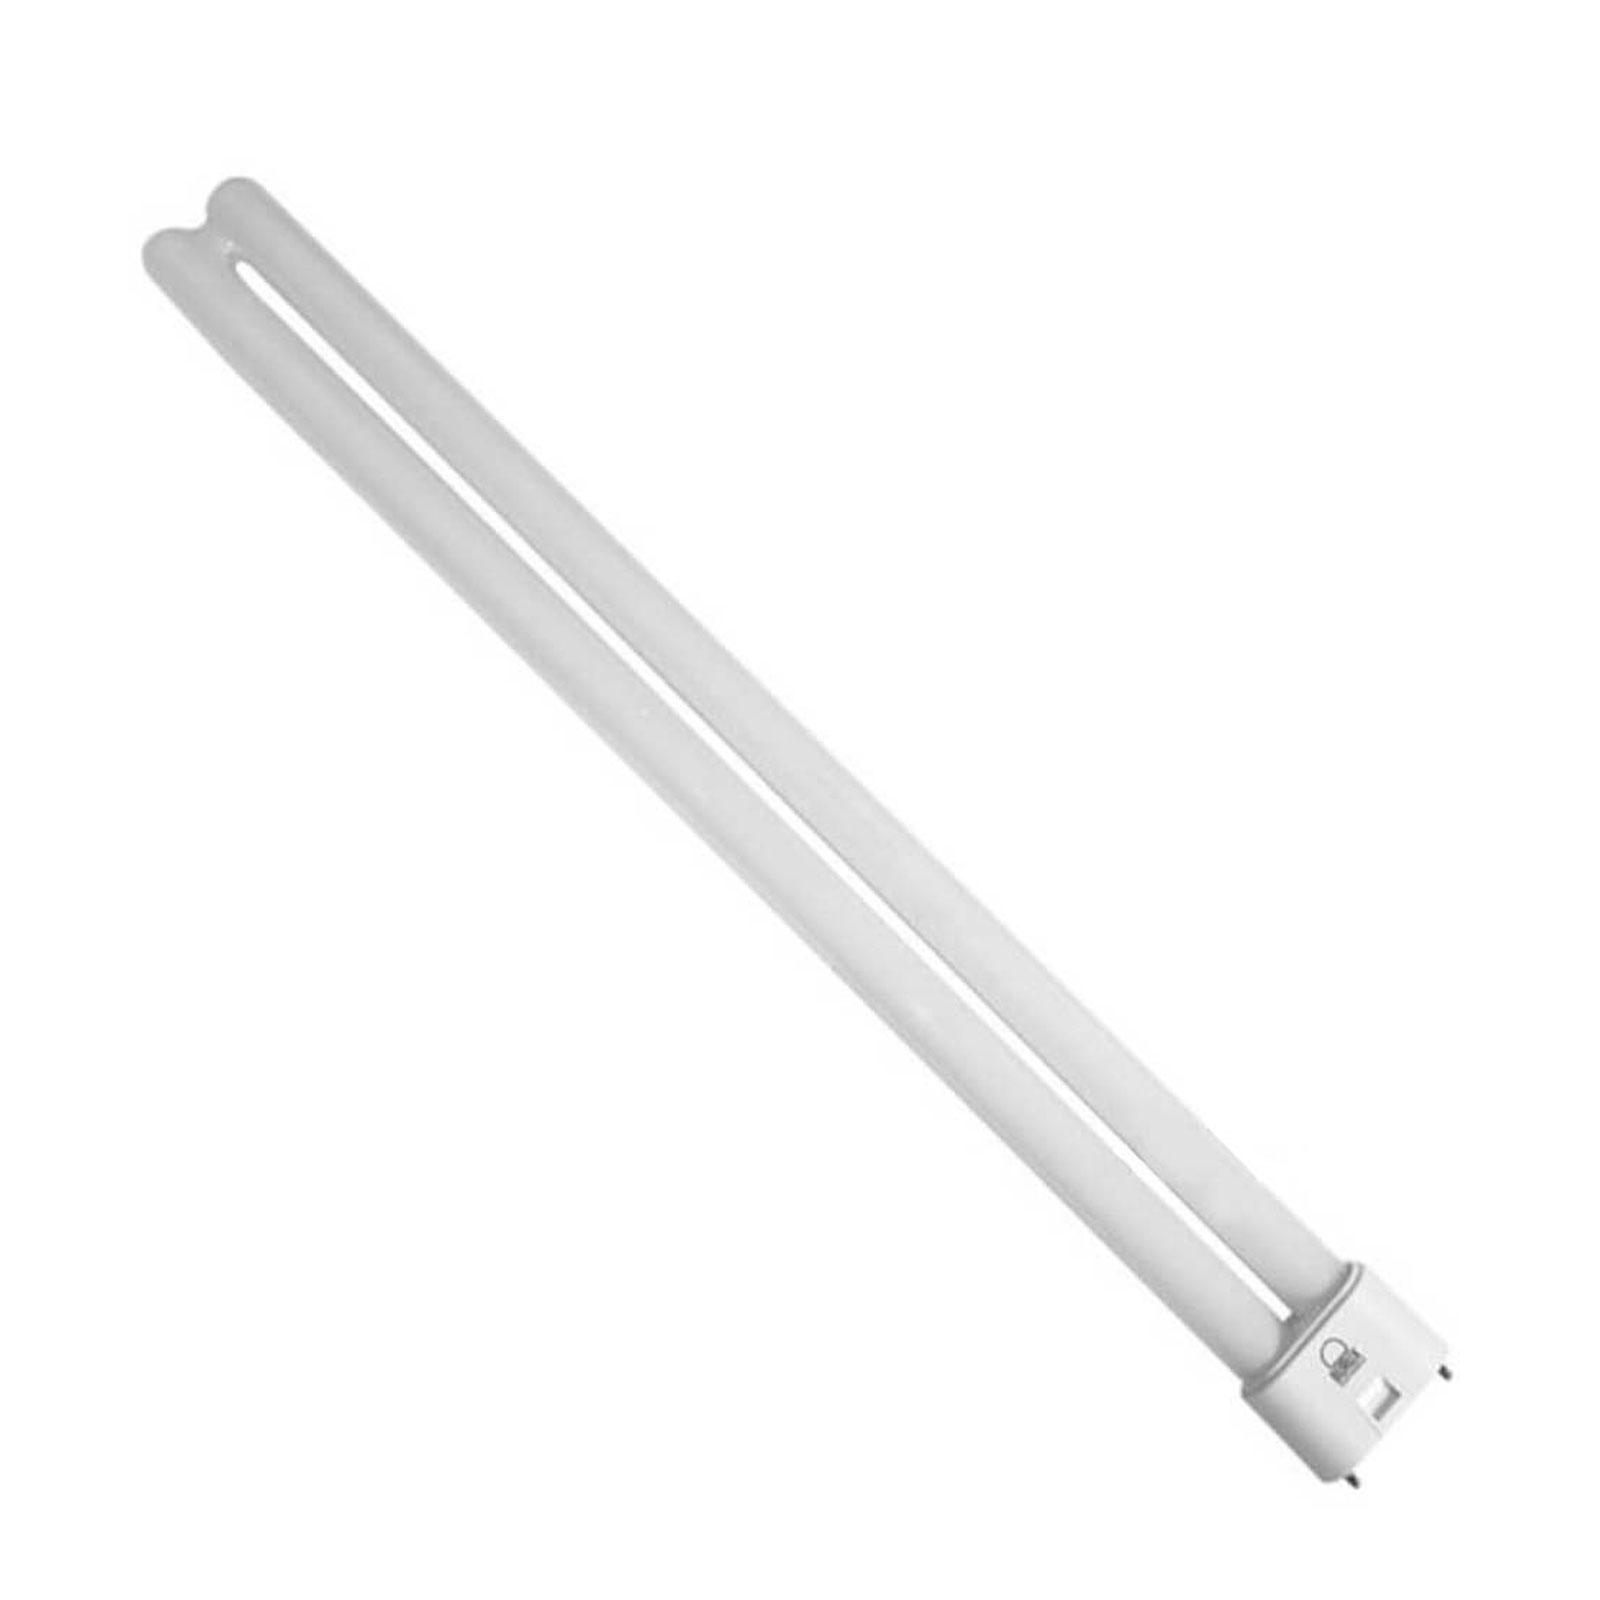 لامپ PLL ال ای دی 18 وات بروکس